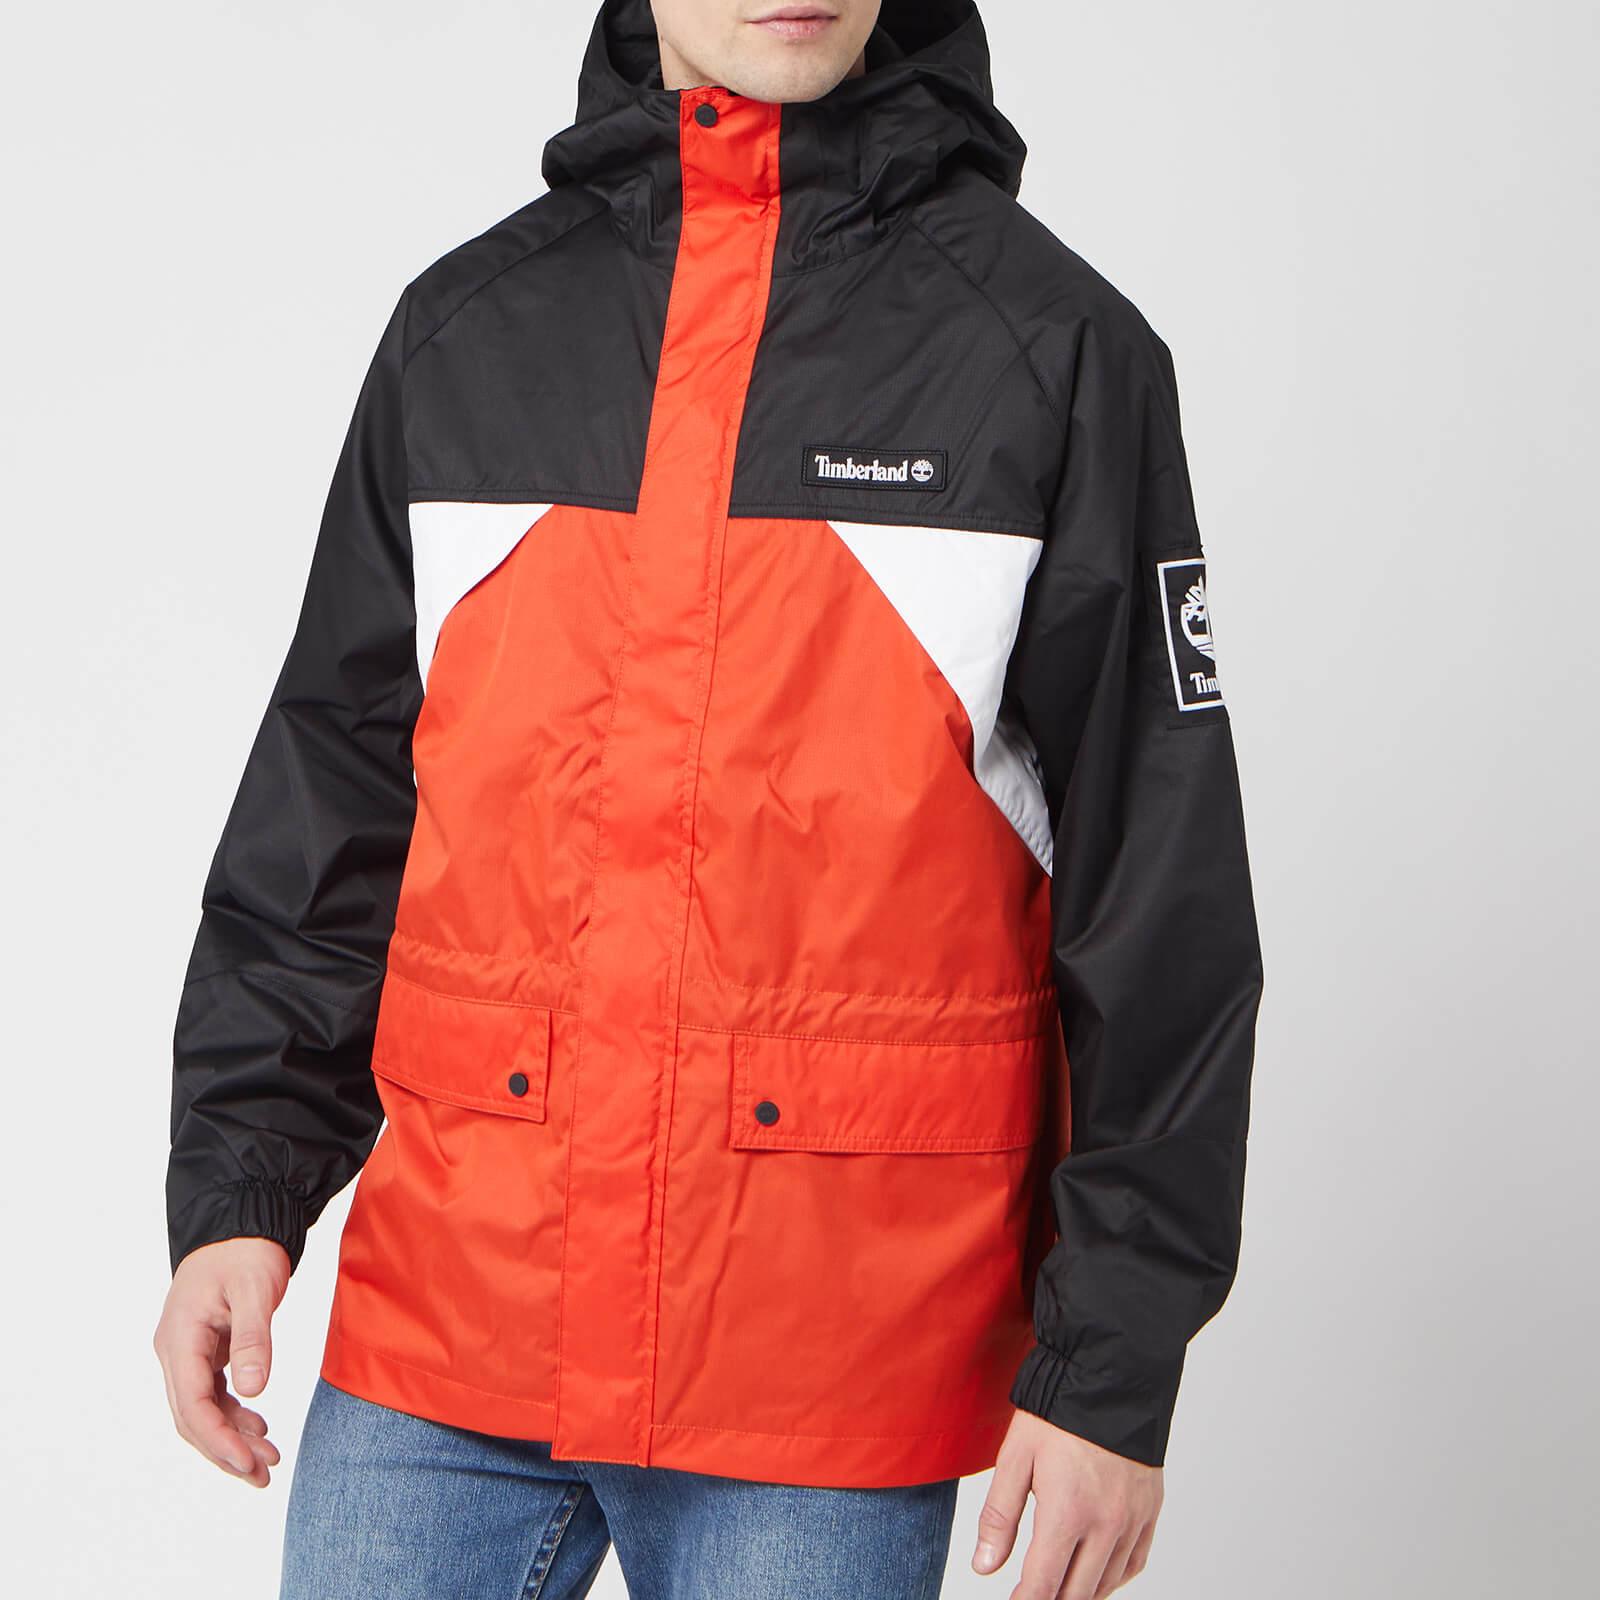 Timberland Men's Outdoor Archive Weather Breaker Coat - White/Spicy Orange/Black - M